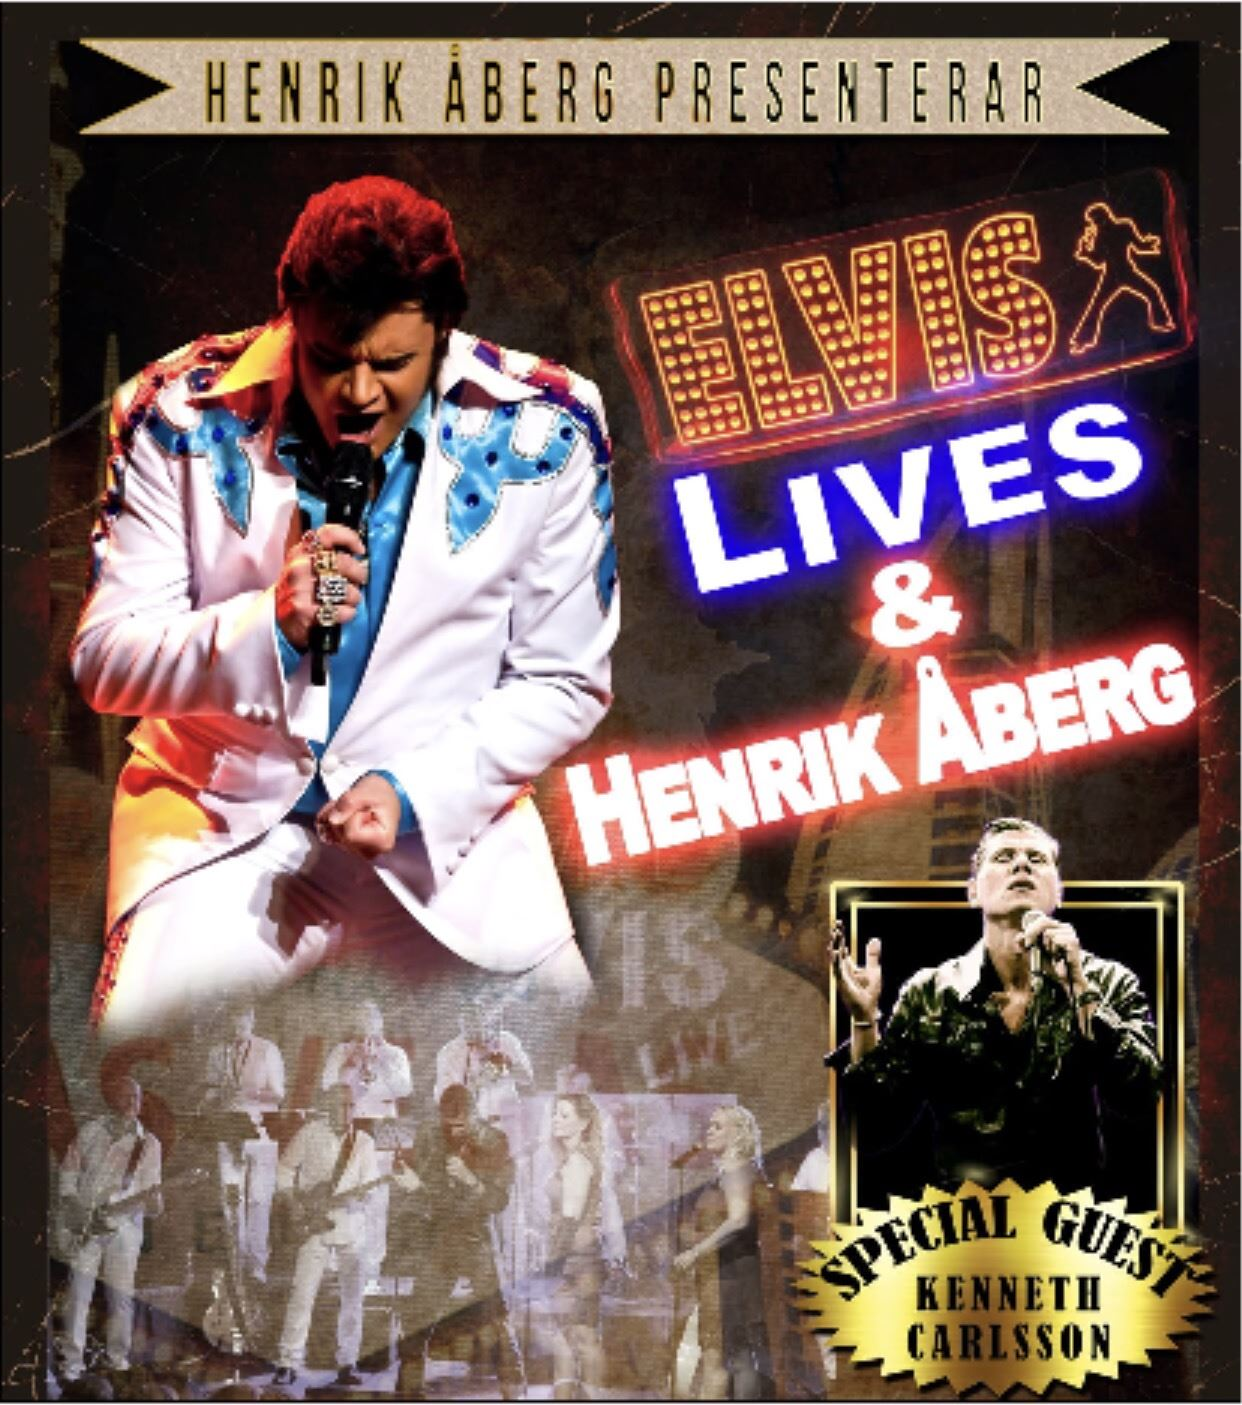 Konsert: Henrik Åberg - Elvis Lives